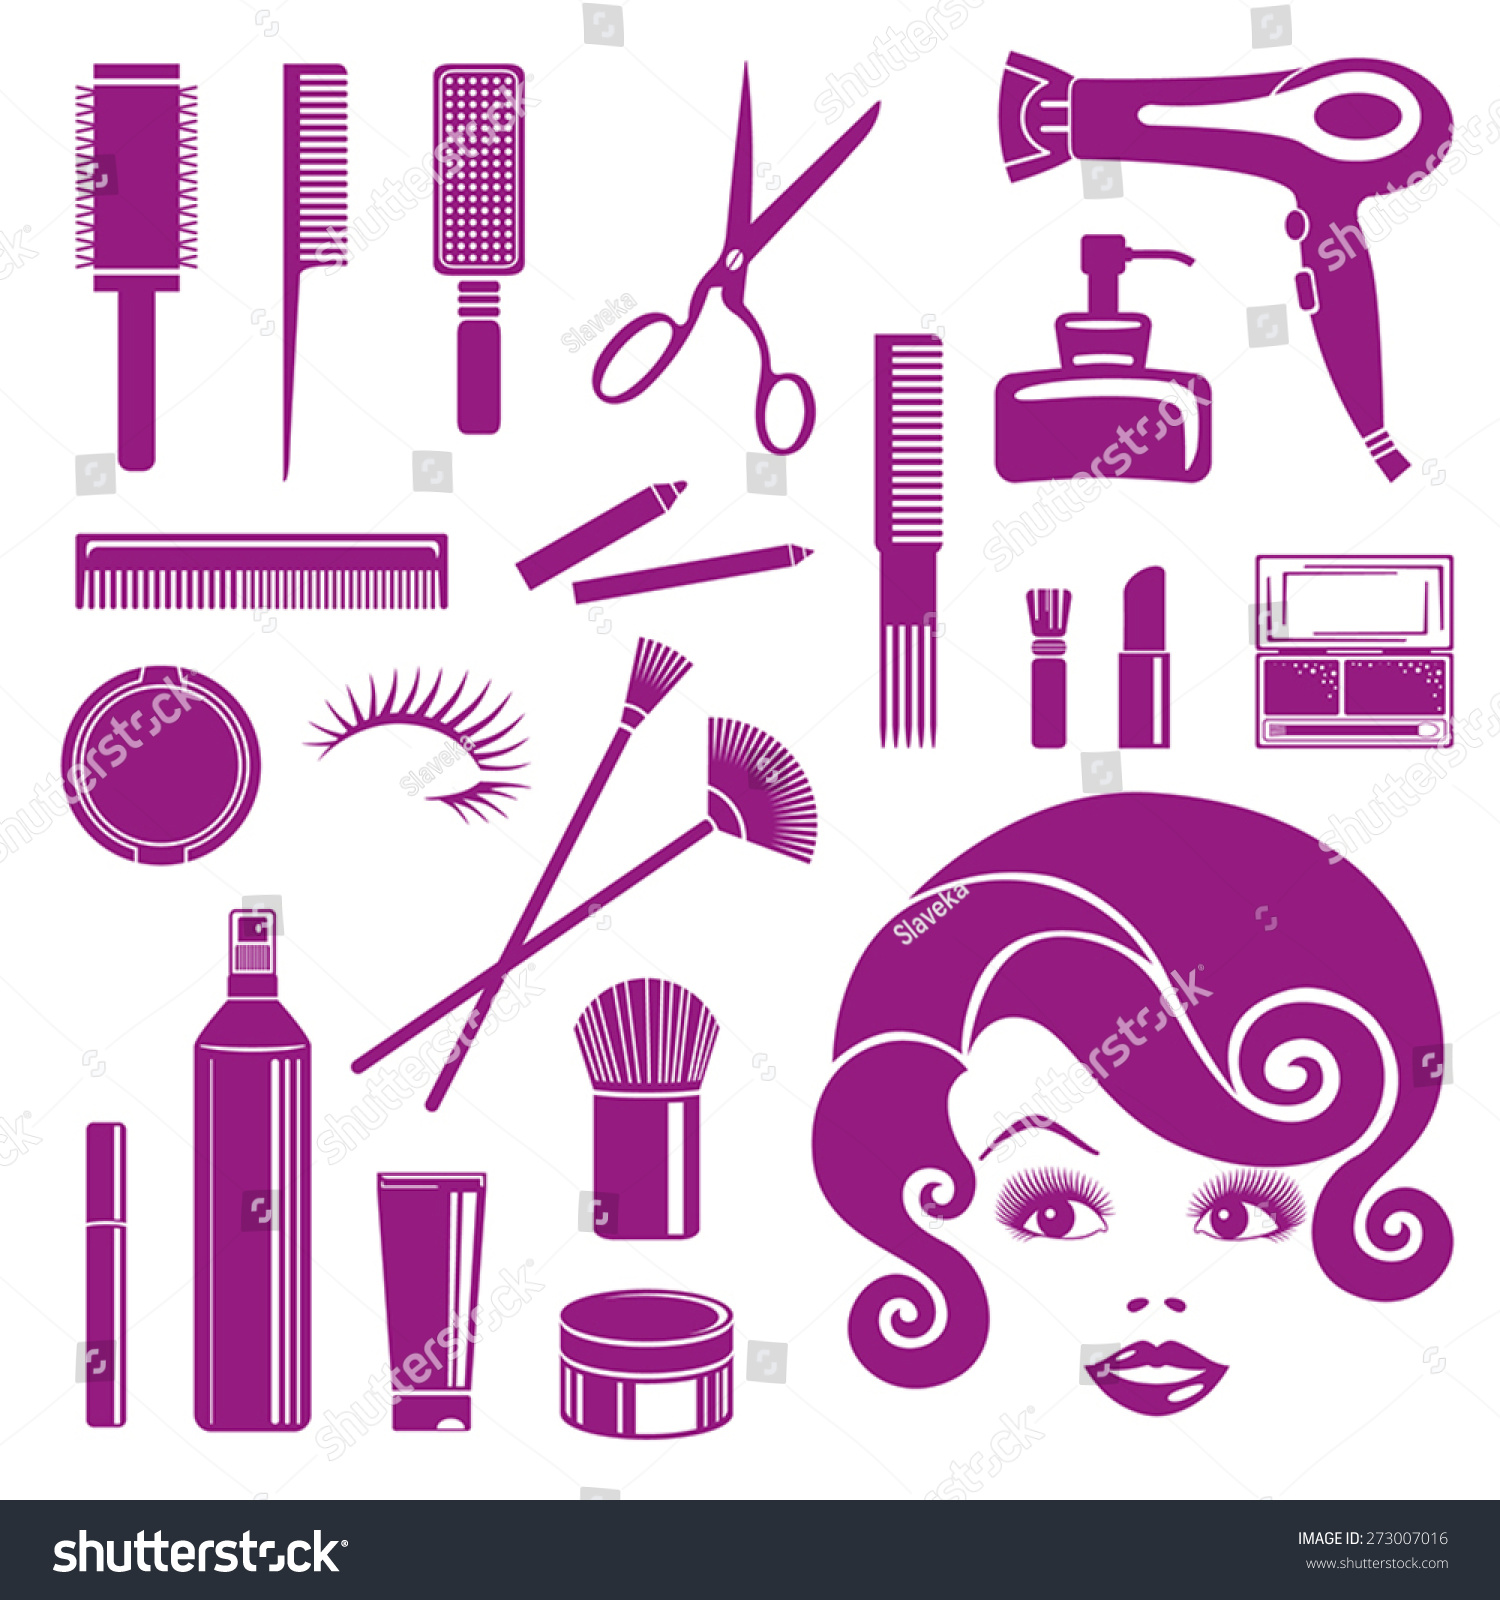 Icons Symbols Hair Salon Beauty Salon Stock Vector Royalty Free